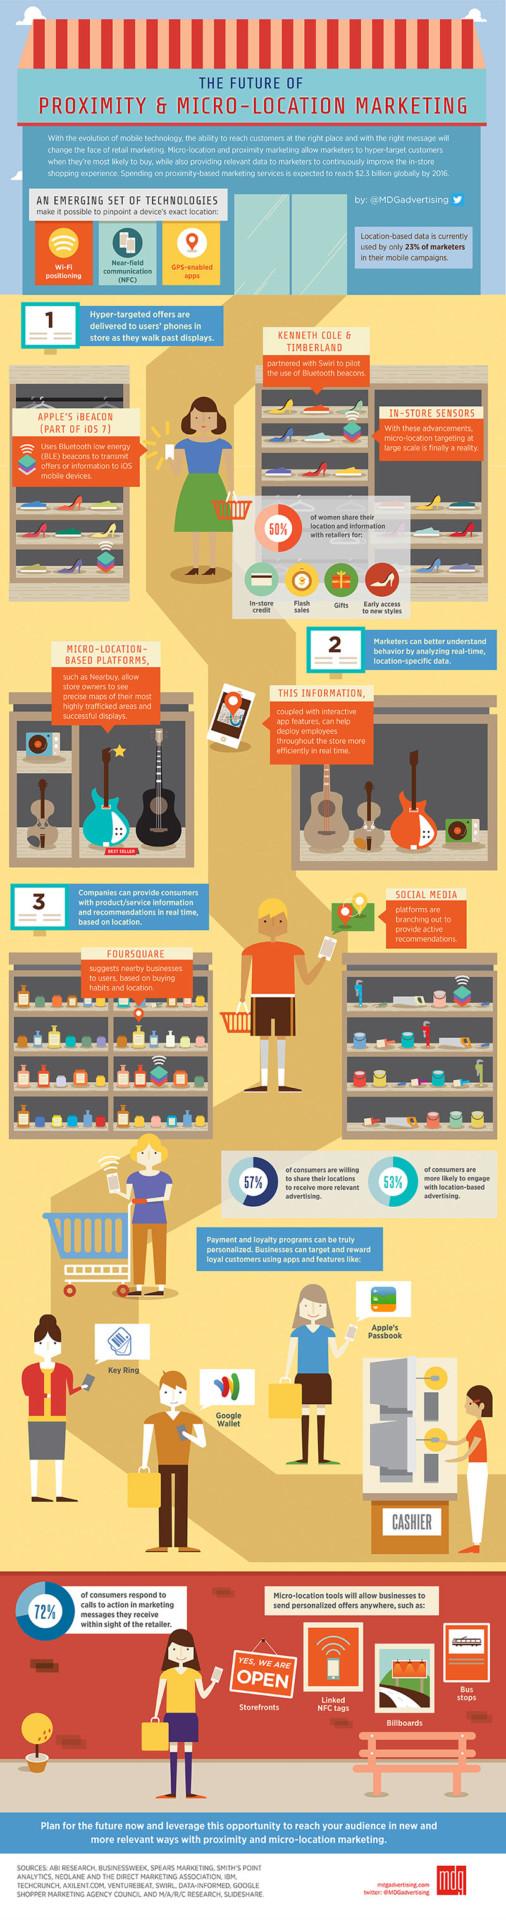 Future of Proximity & Micro-Location Marketing - Infographic